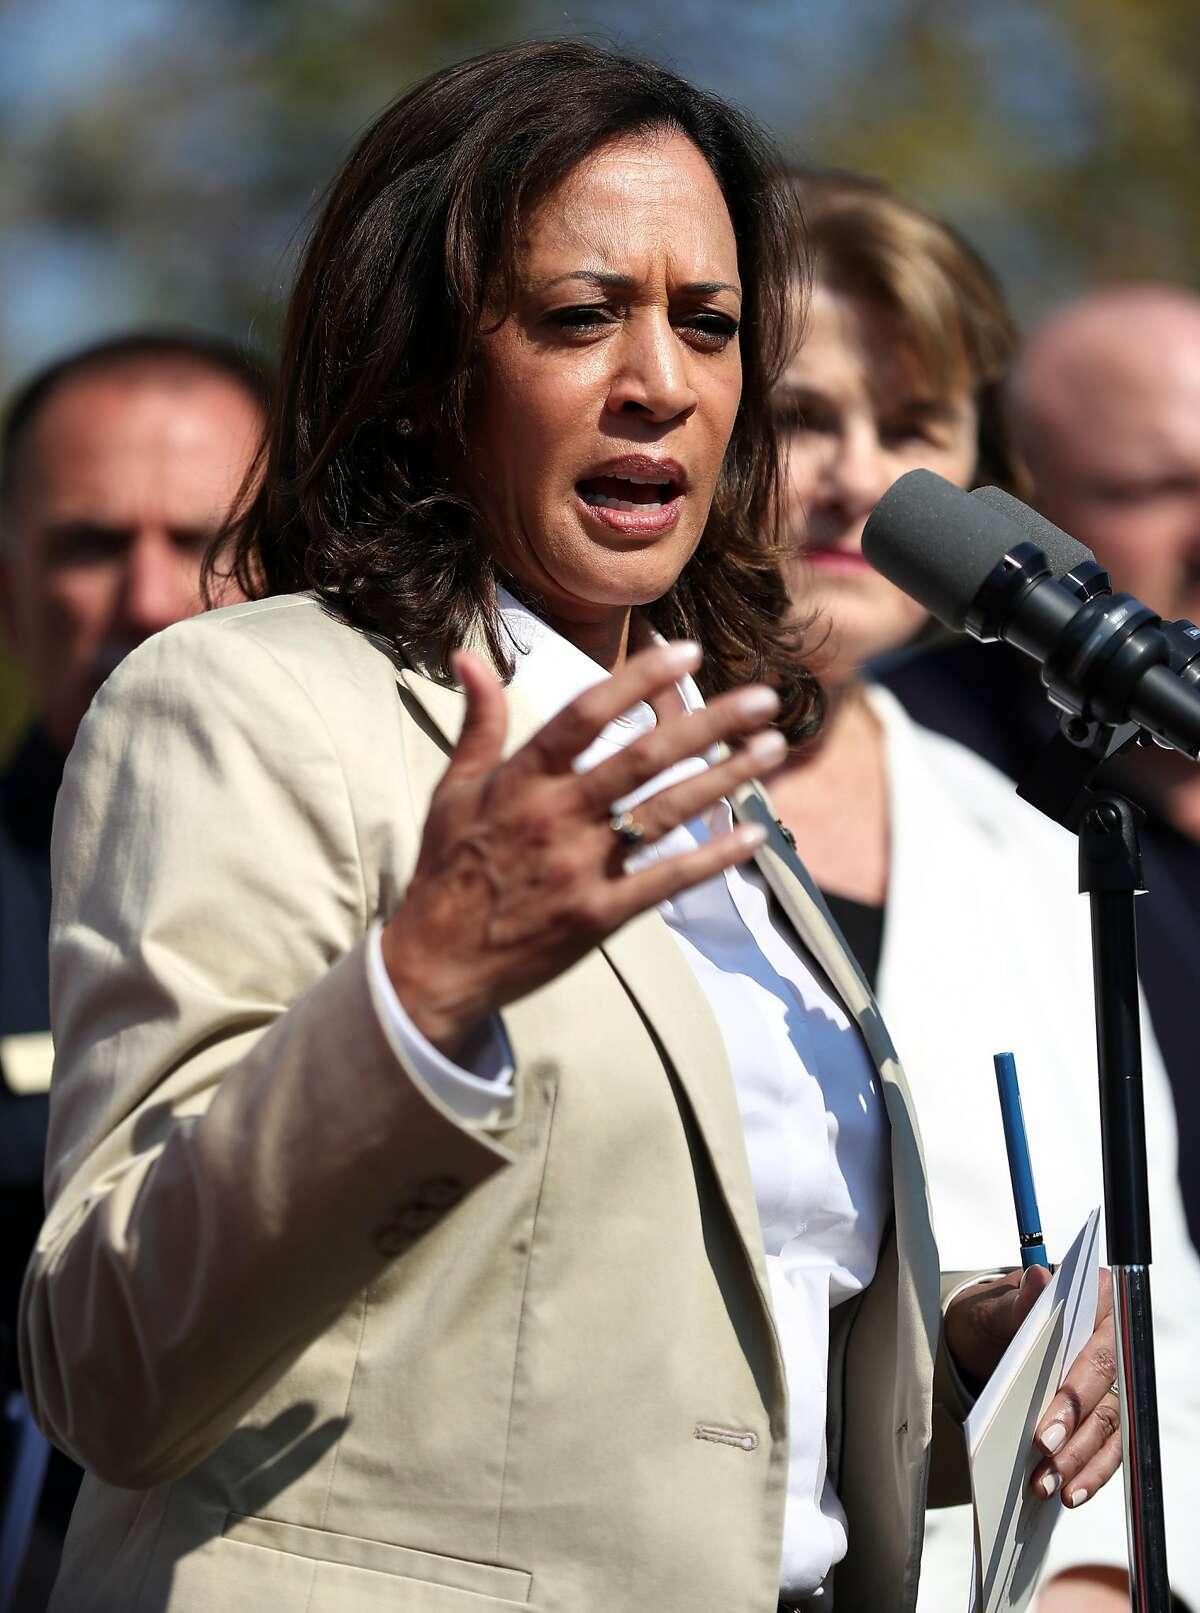 Senator Kamala Harris addresses the media before a Sonoma County Fire Response and Recovery community meeting at Santa Rosa High School in Santa Rosa, Calif., on Saturday, October 14, 2017.